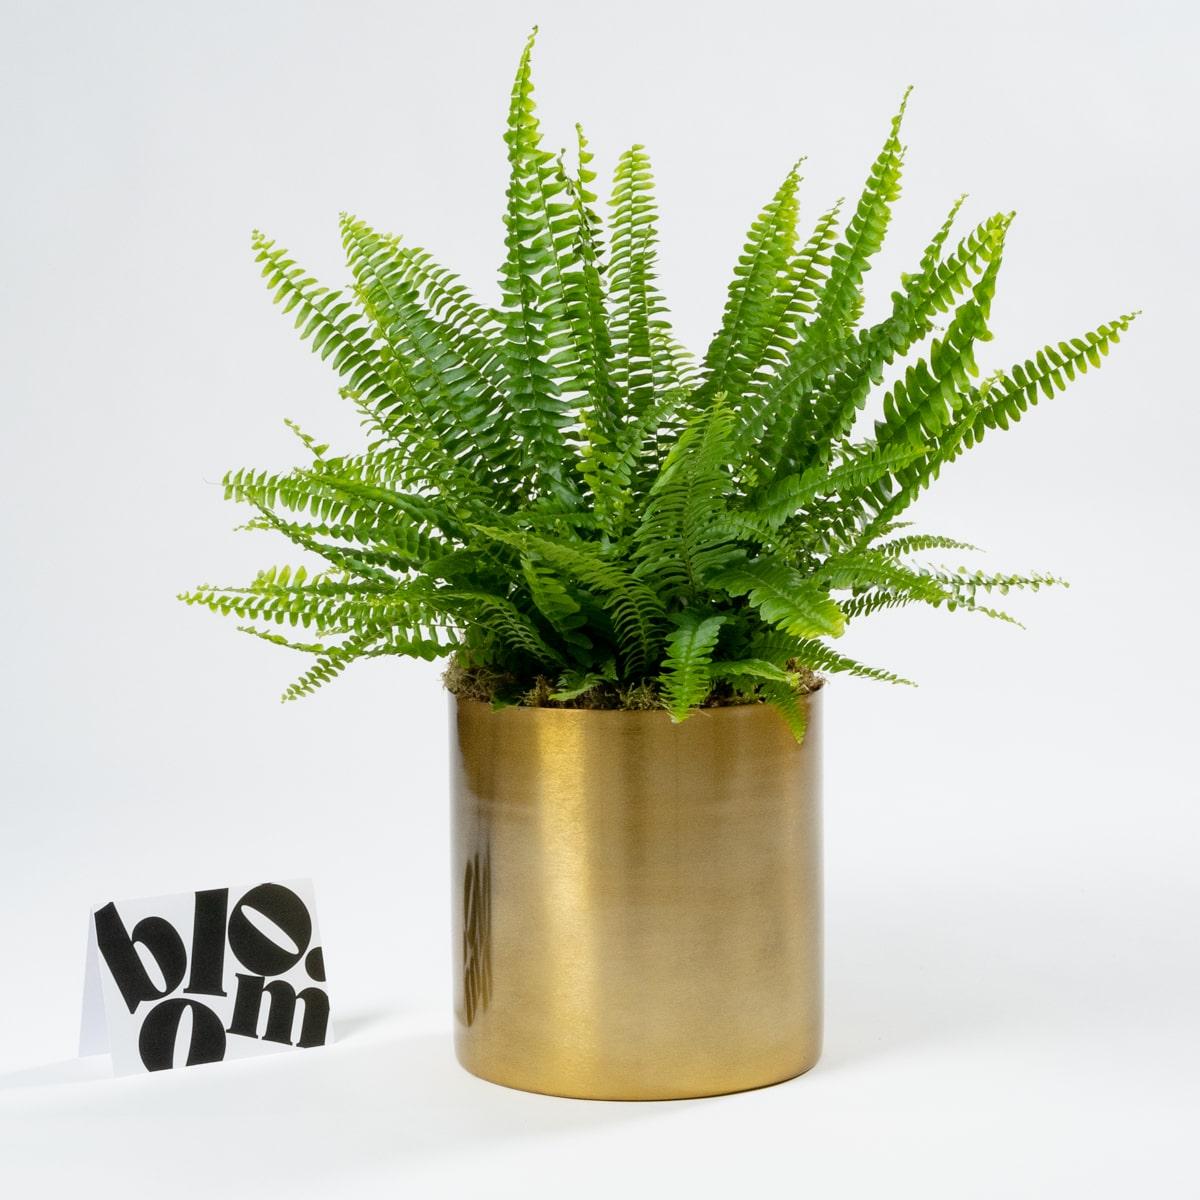 bloom - Tall Brass Plant Pot & Vase